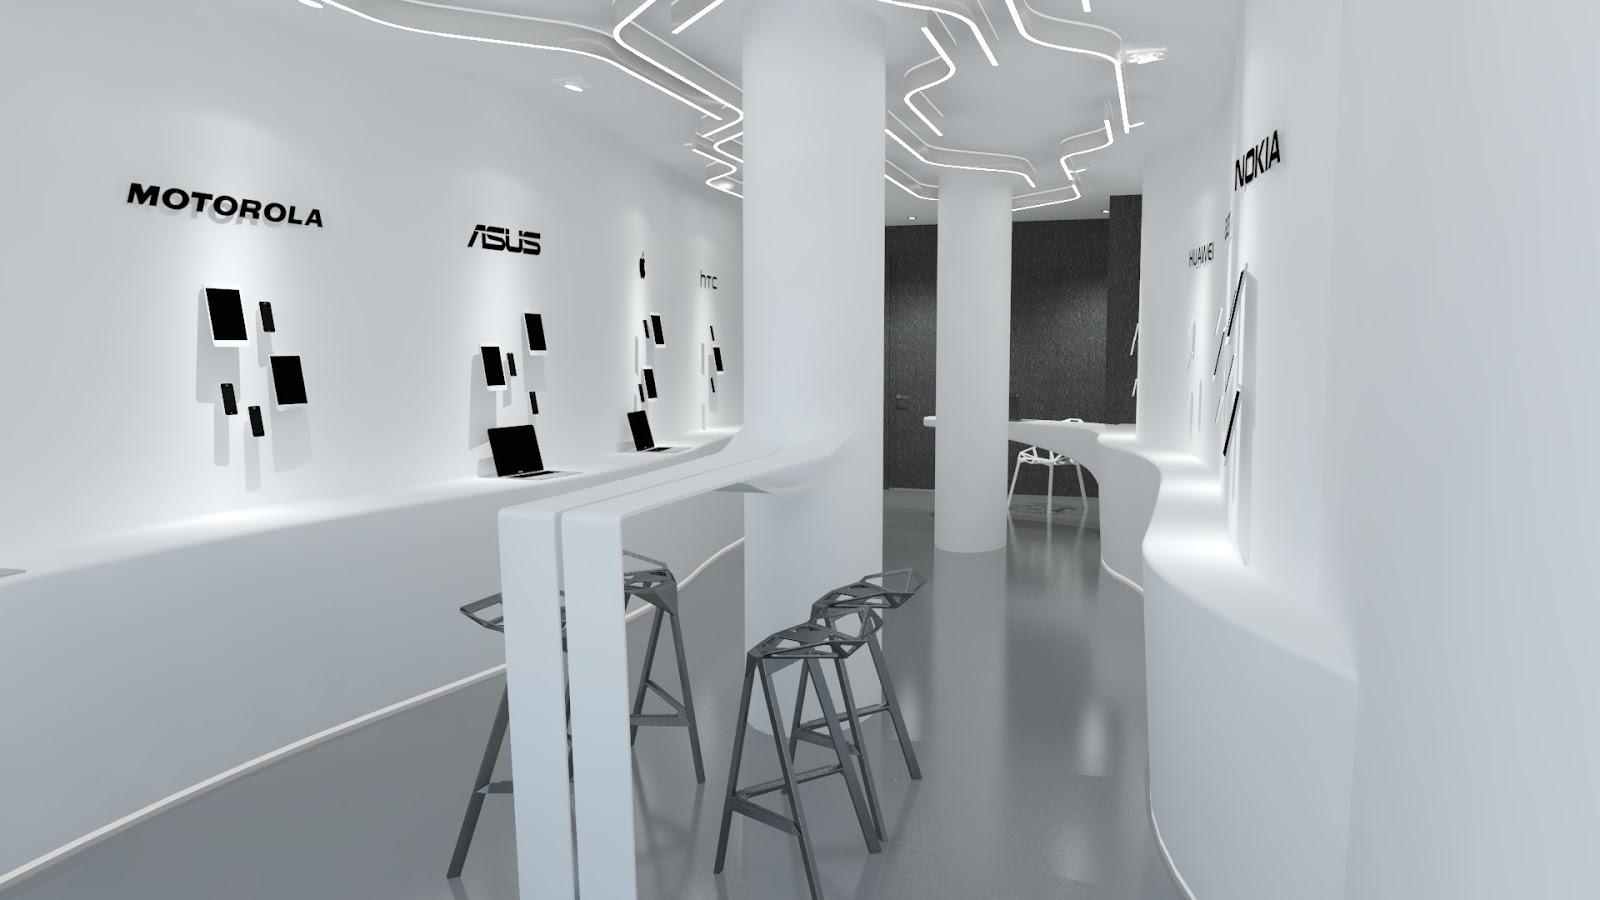 Dise o de interiores escuela de arte de motril - Escuela decoracion de interiores ...